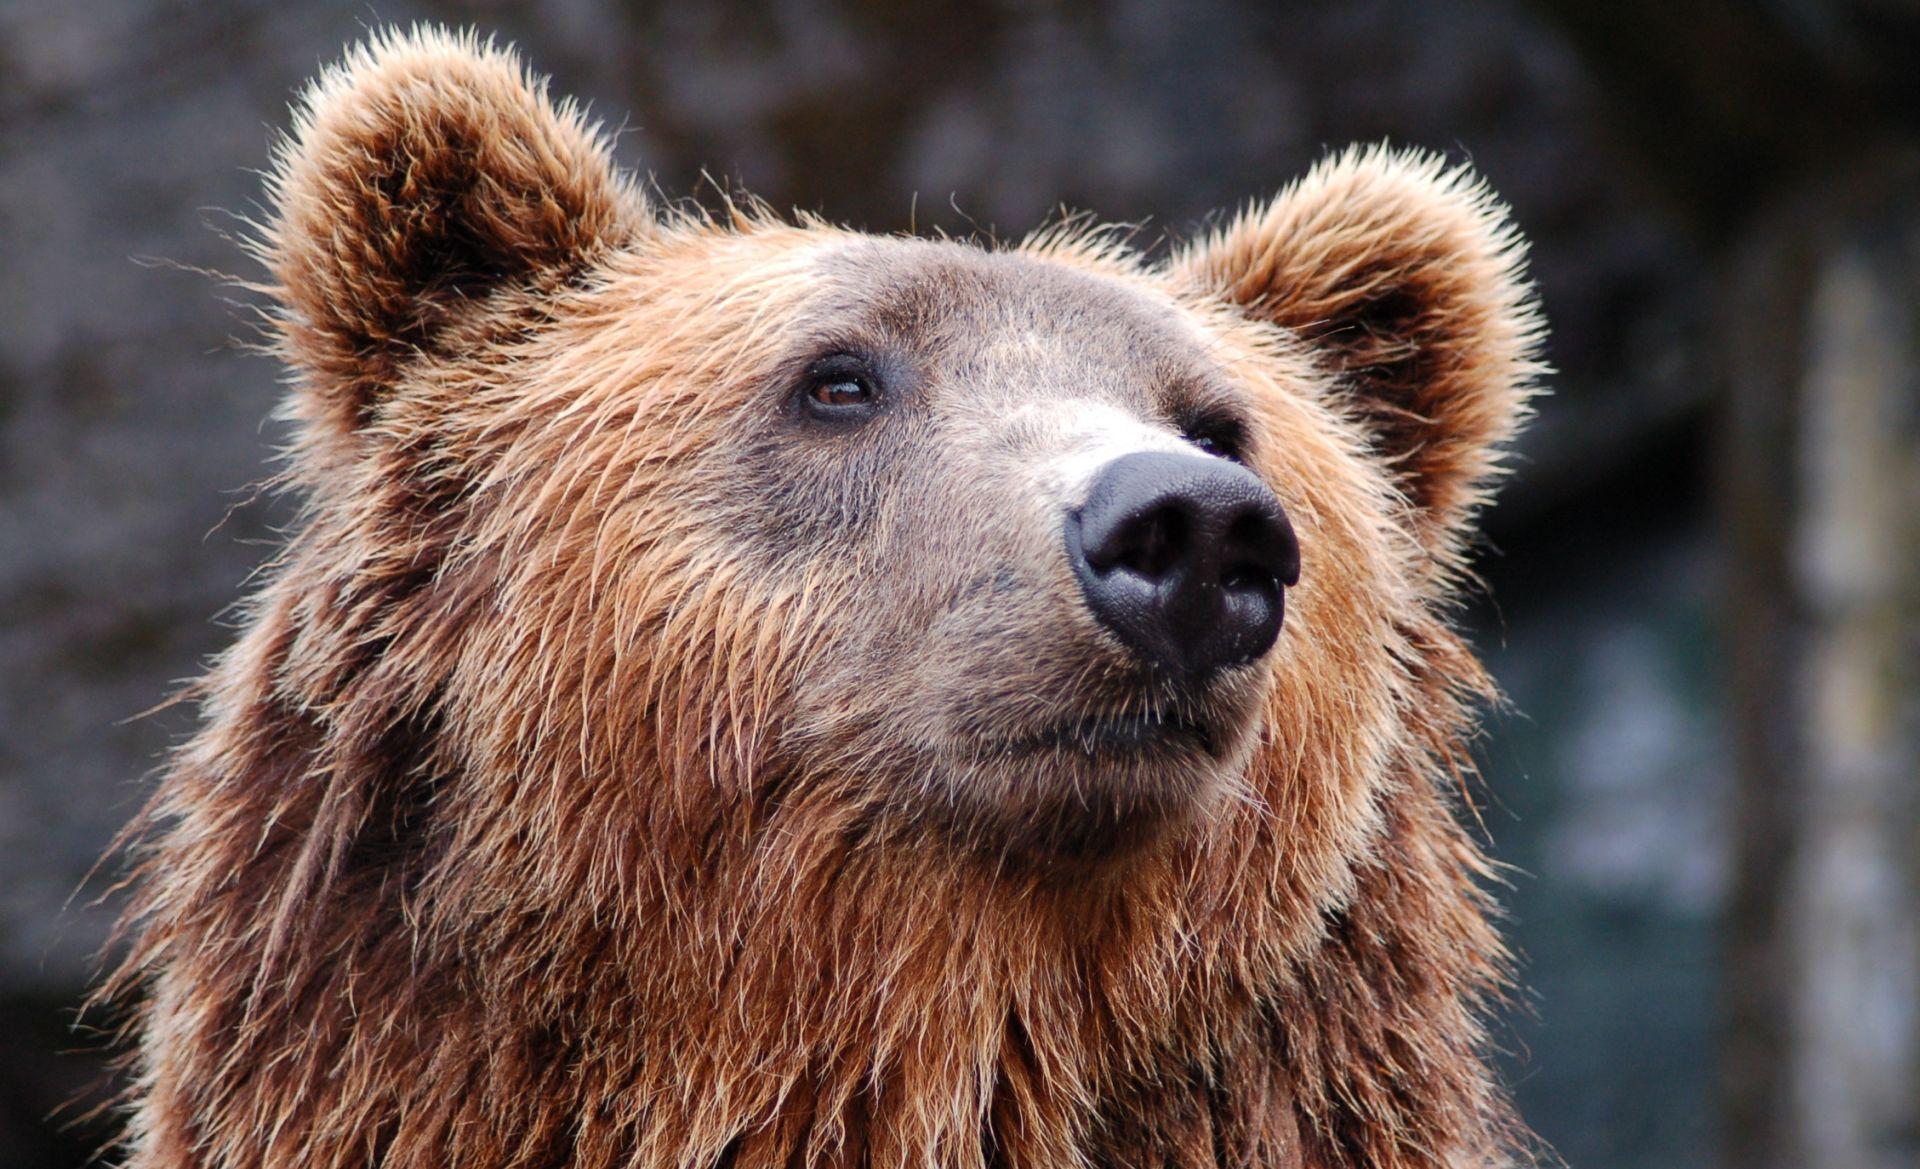 HGSS spasio planinara – slomio nogu bježeći od medvjeda